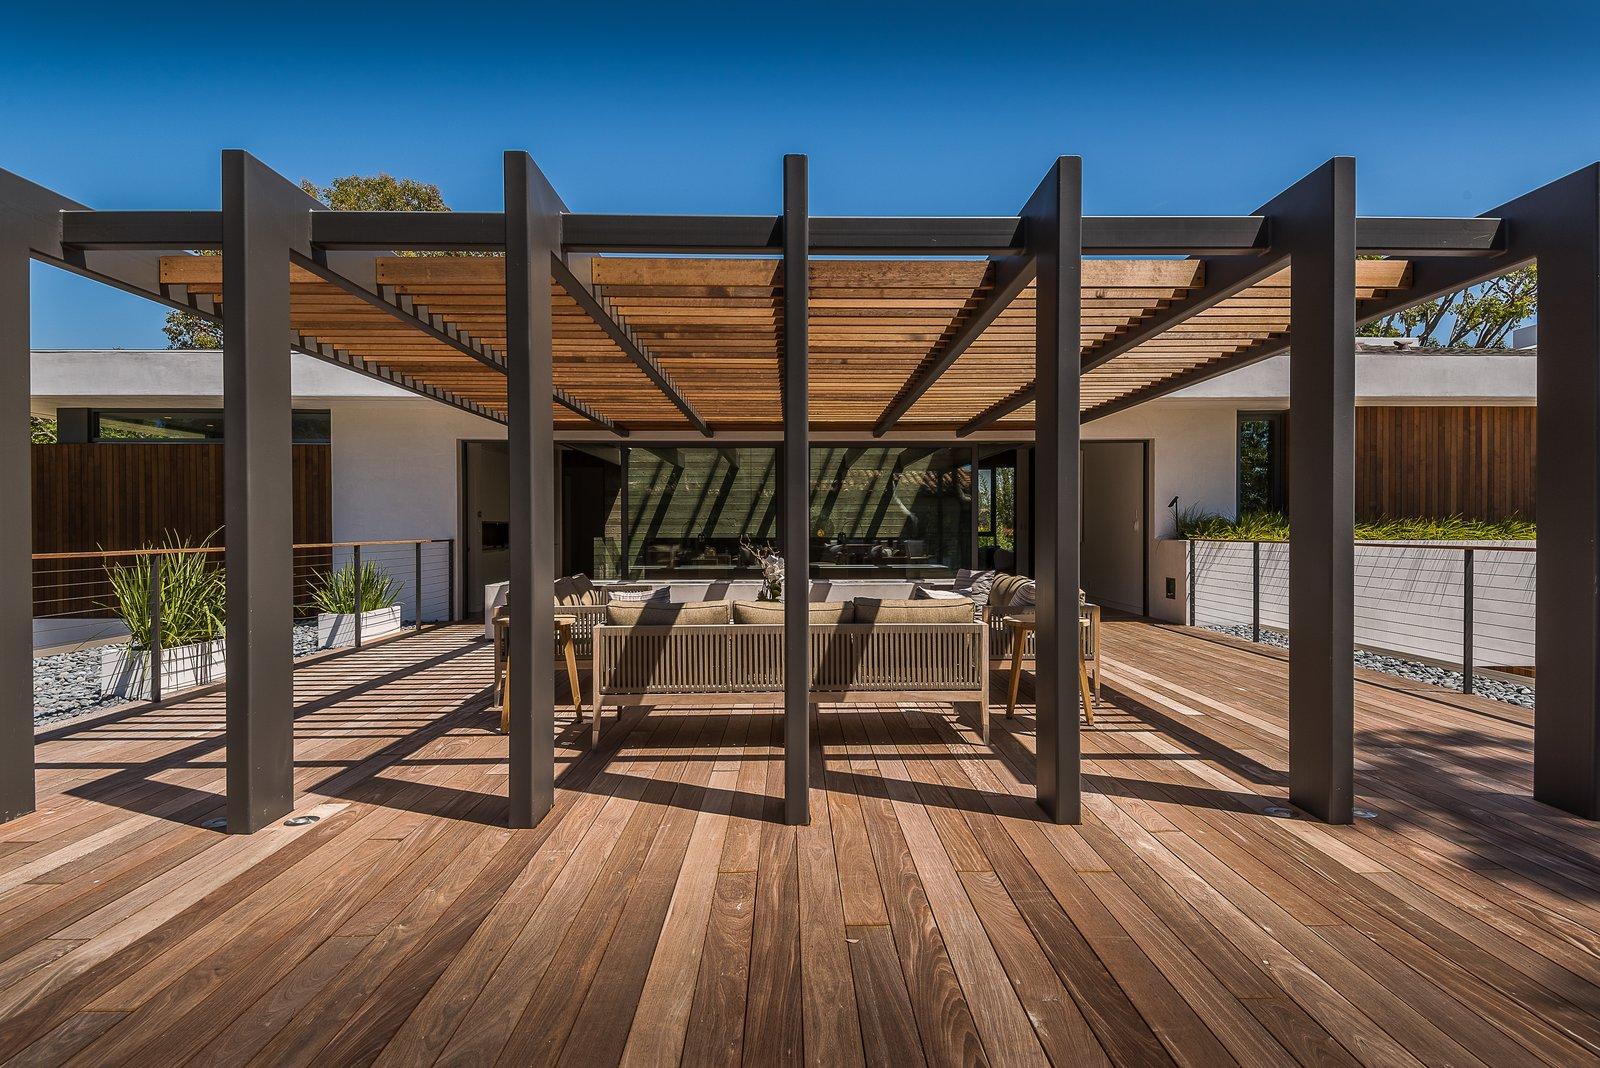 Roof Terrace / Tellis  Amalfi Drive Residence by Daryl Olesinski